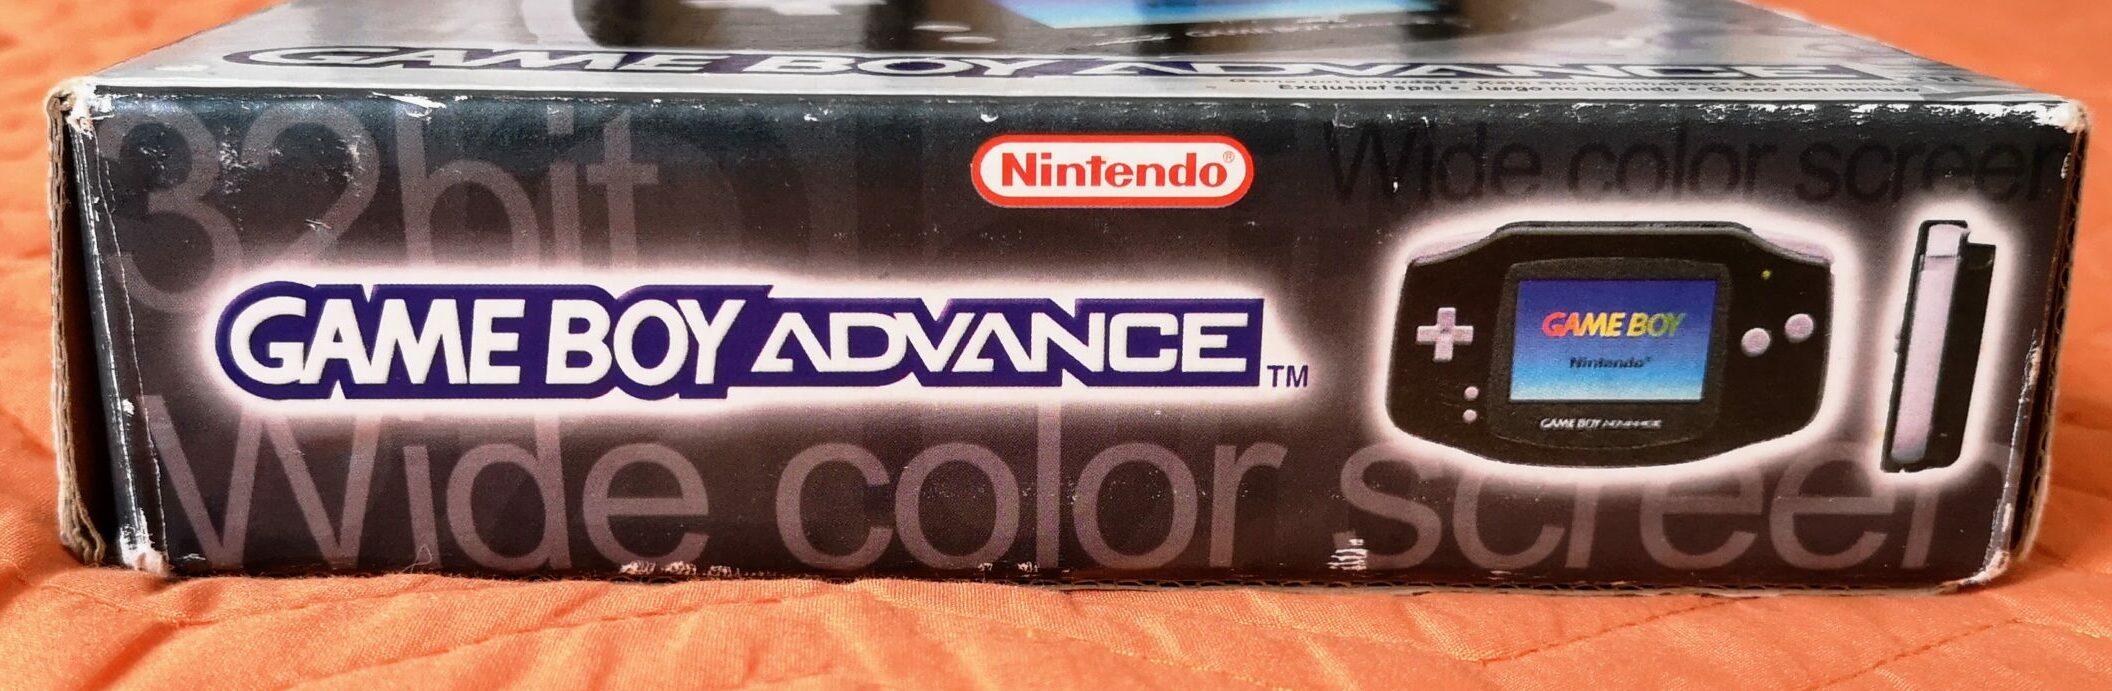 Game Boy Advance, scatola lato 1